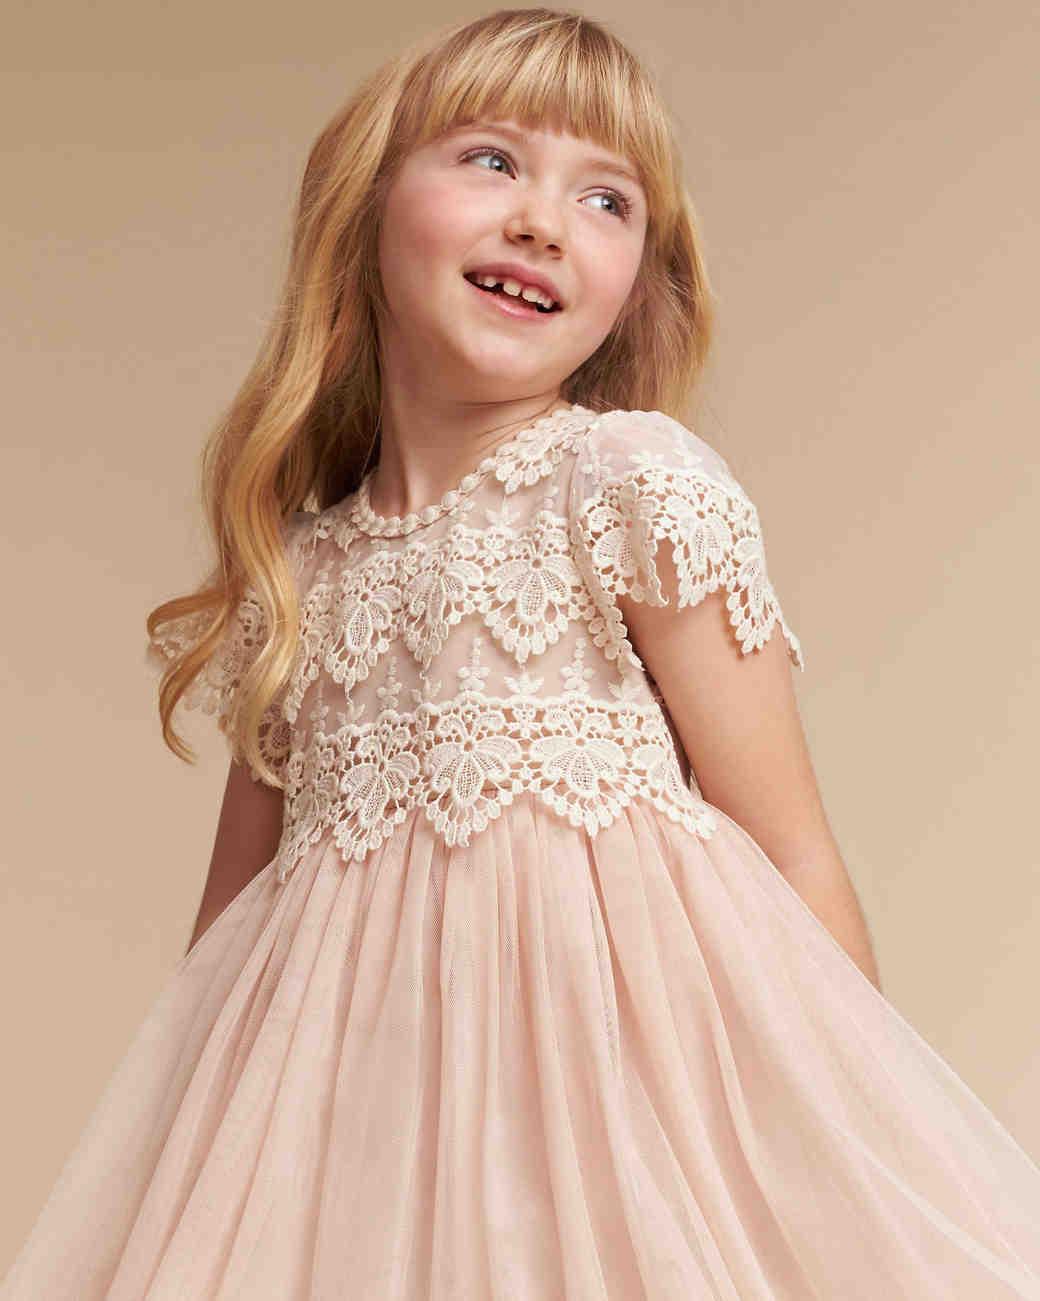 3a2c9b3221c7f The Sweetest Lace Flower Girl Dresses | Martha Stewart Weddings